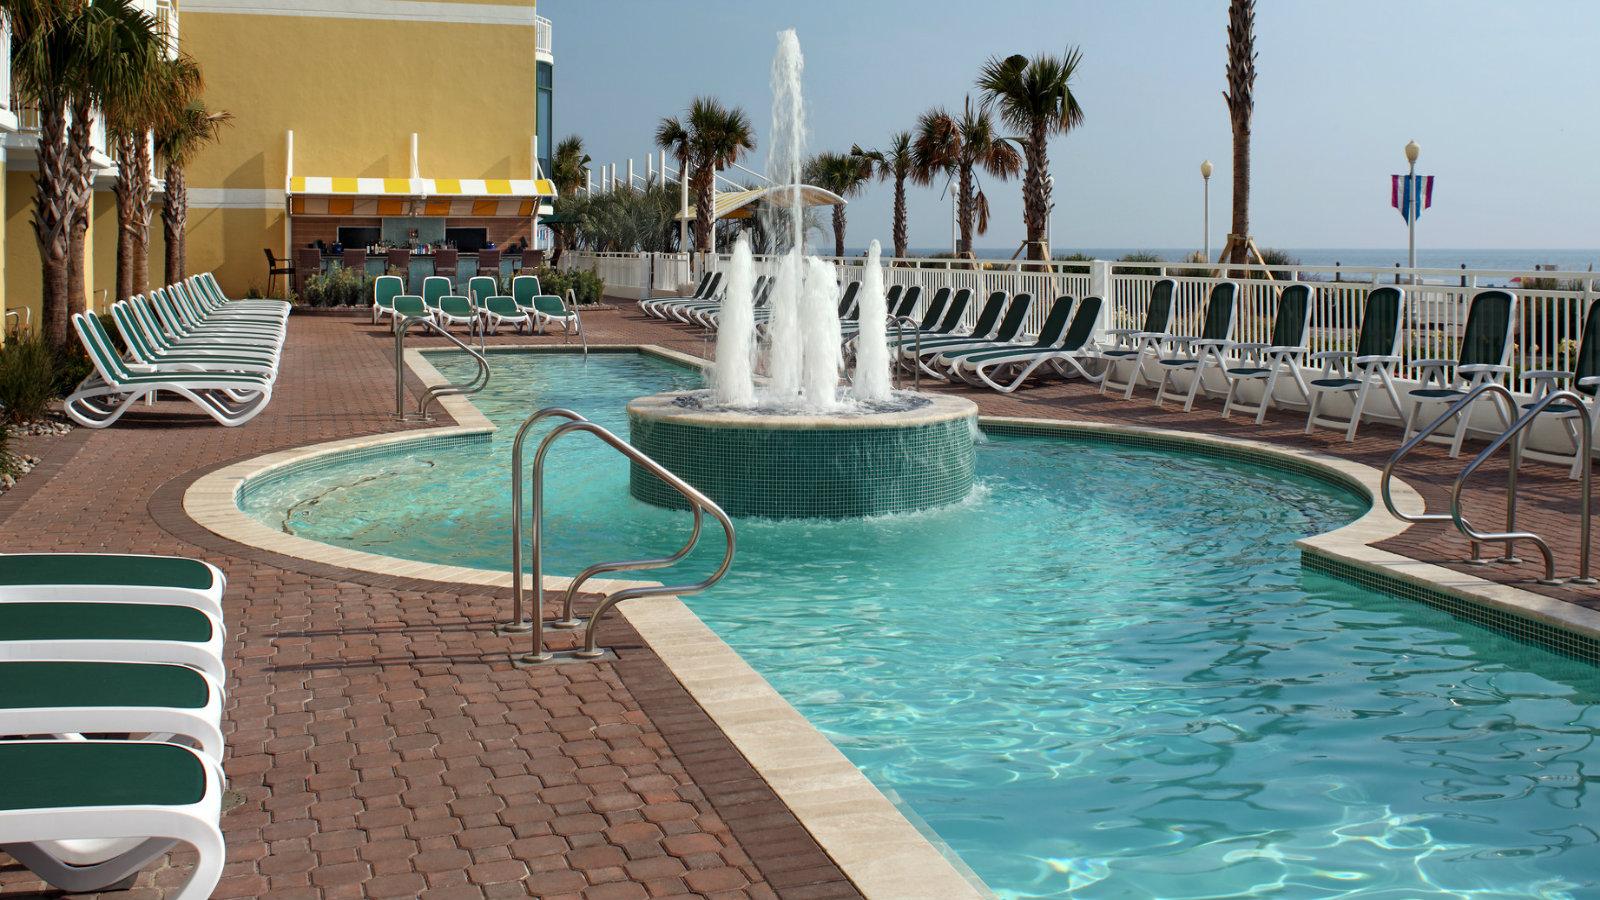 Best Kitchen Gallery: Hotel Features Sheraton Virginia Beach Oceanfront Hotel of Virginia Beach Resorts Hotel  on rachelxblog.com